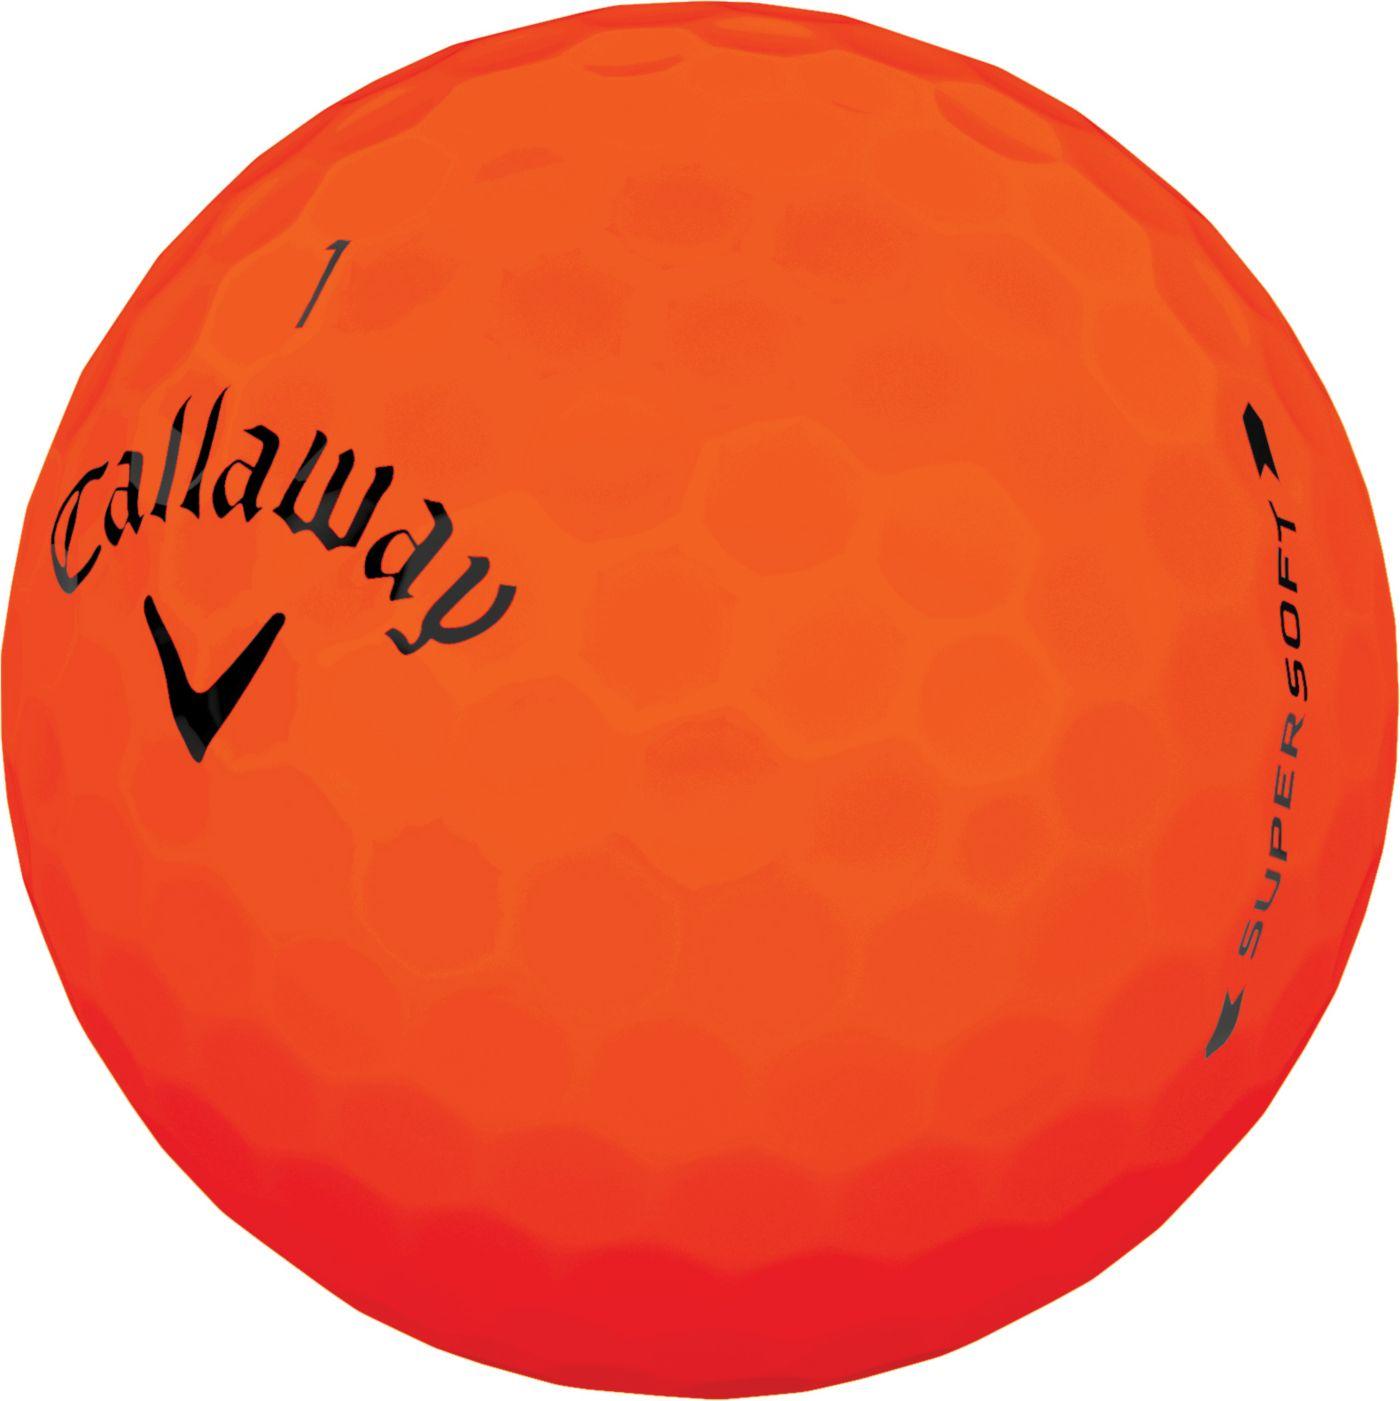 Callaway 2019 Supersoft Matte Orange Personalized Golf Balls